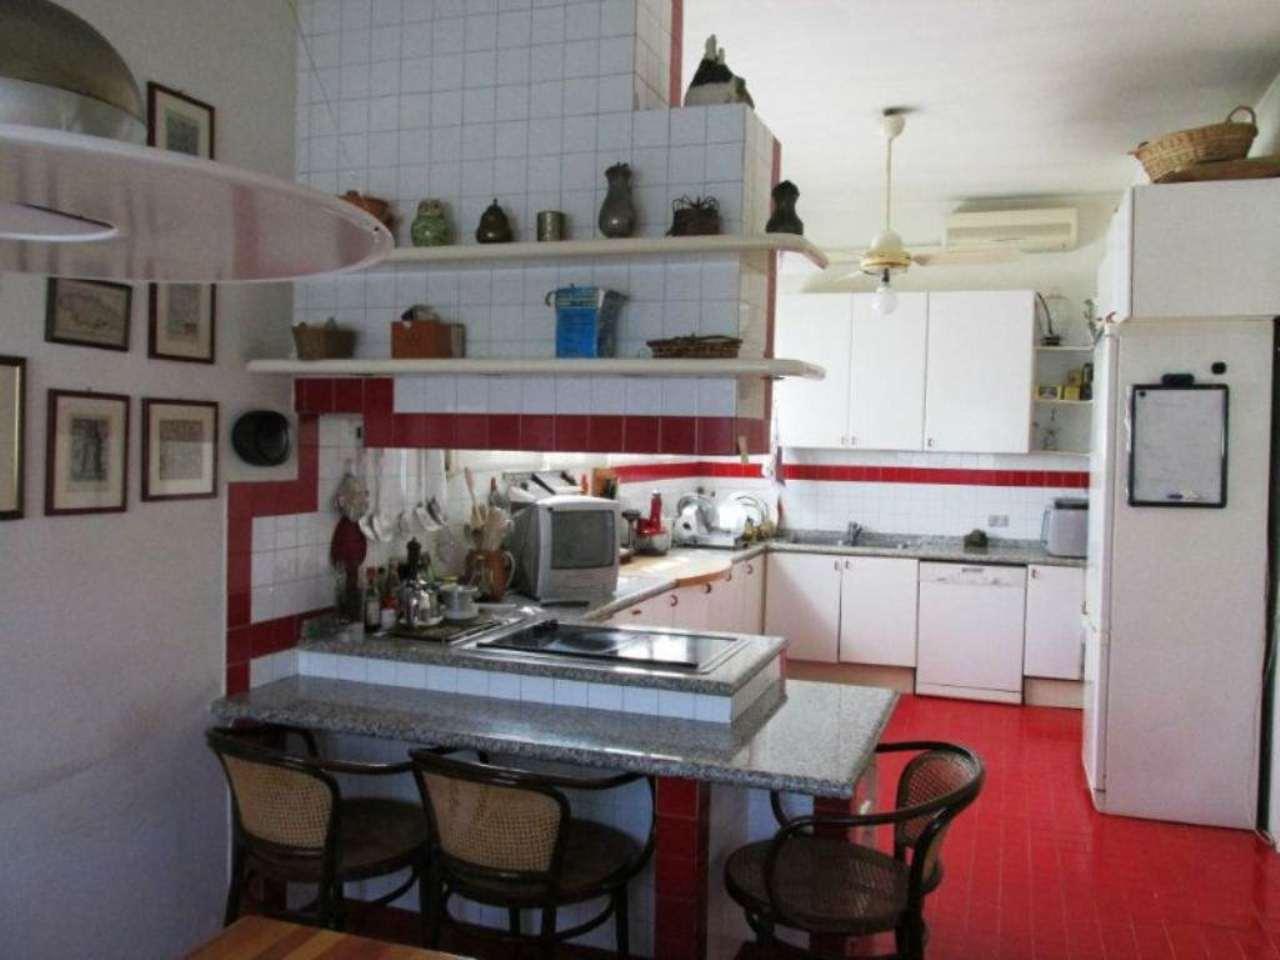 Villa in Vendita a Segrate: 5 locali, 170 mq - Foto 6